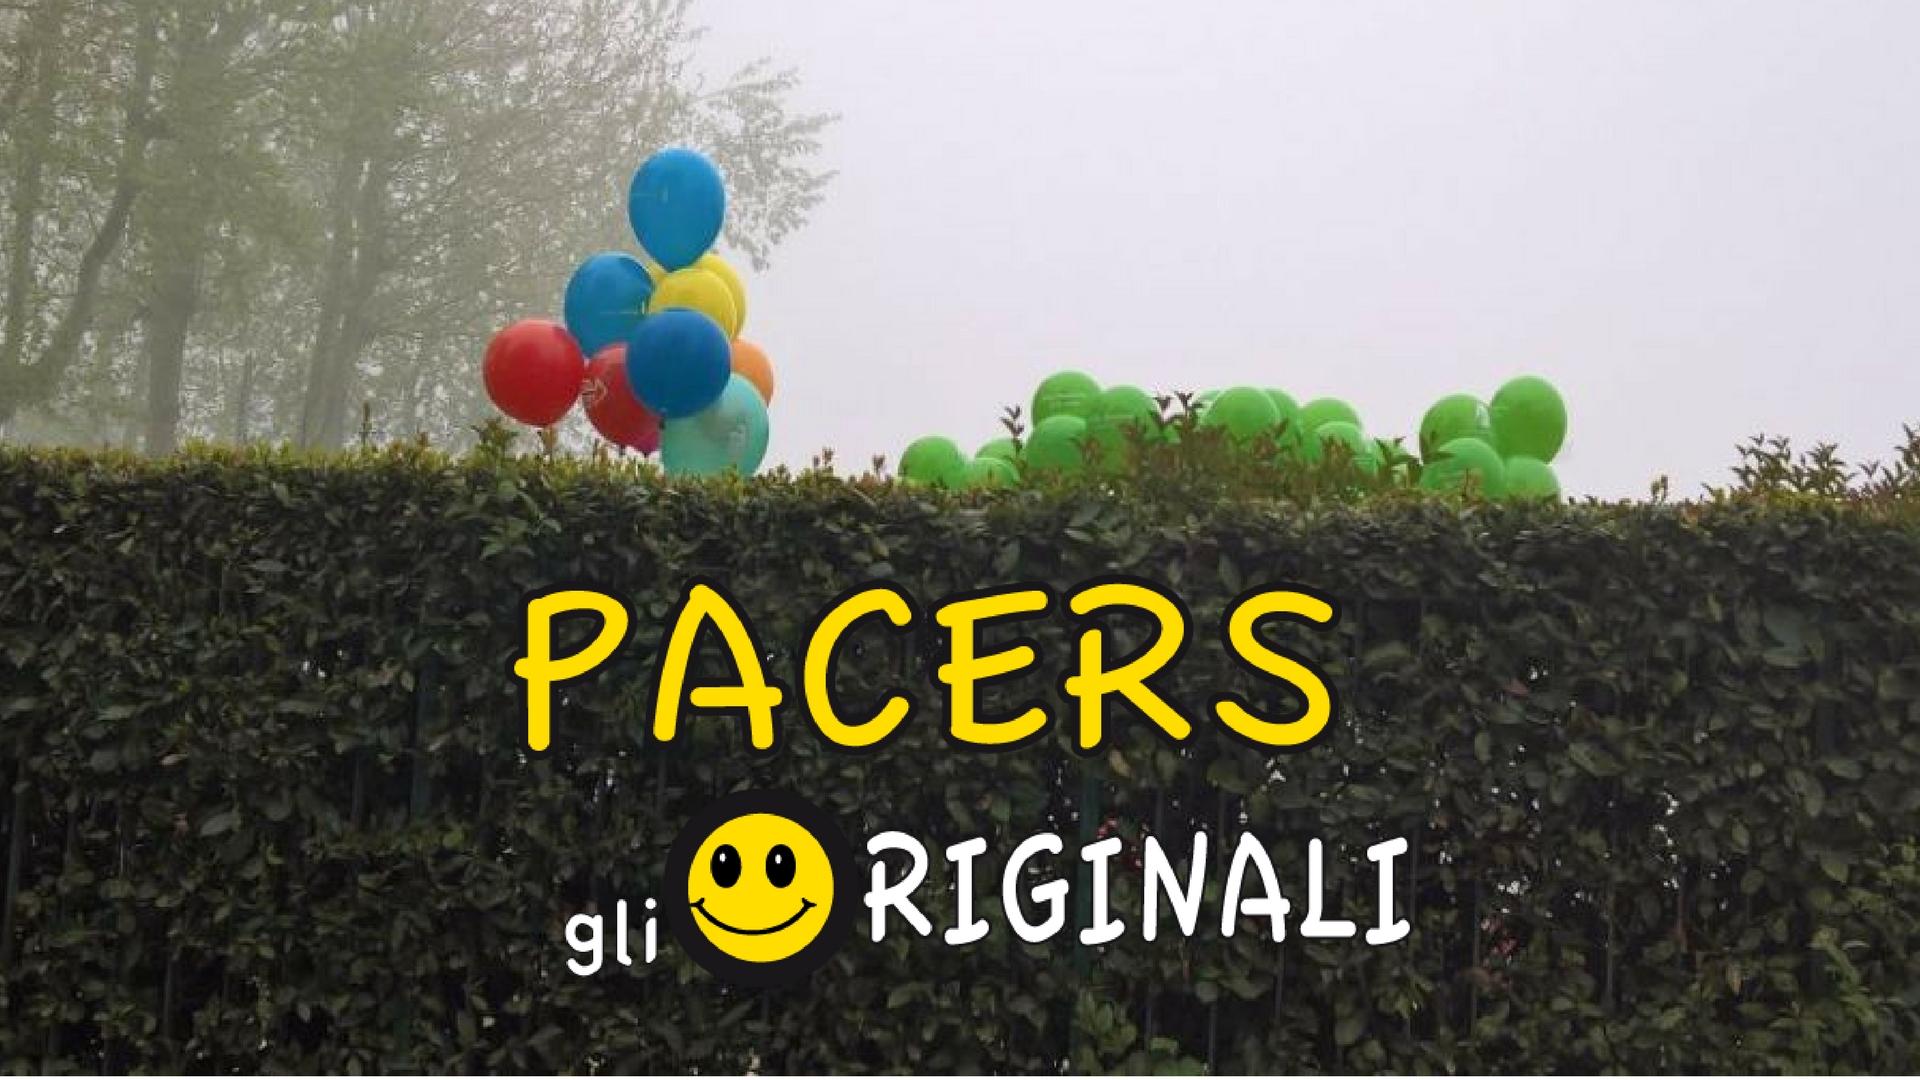 pacers-gli-originali_eroica15-18_marathon_vittorio-veneto_maratonia_vittoria